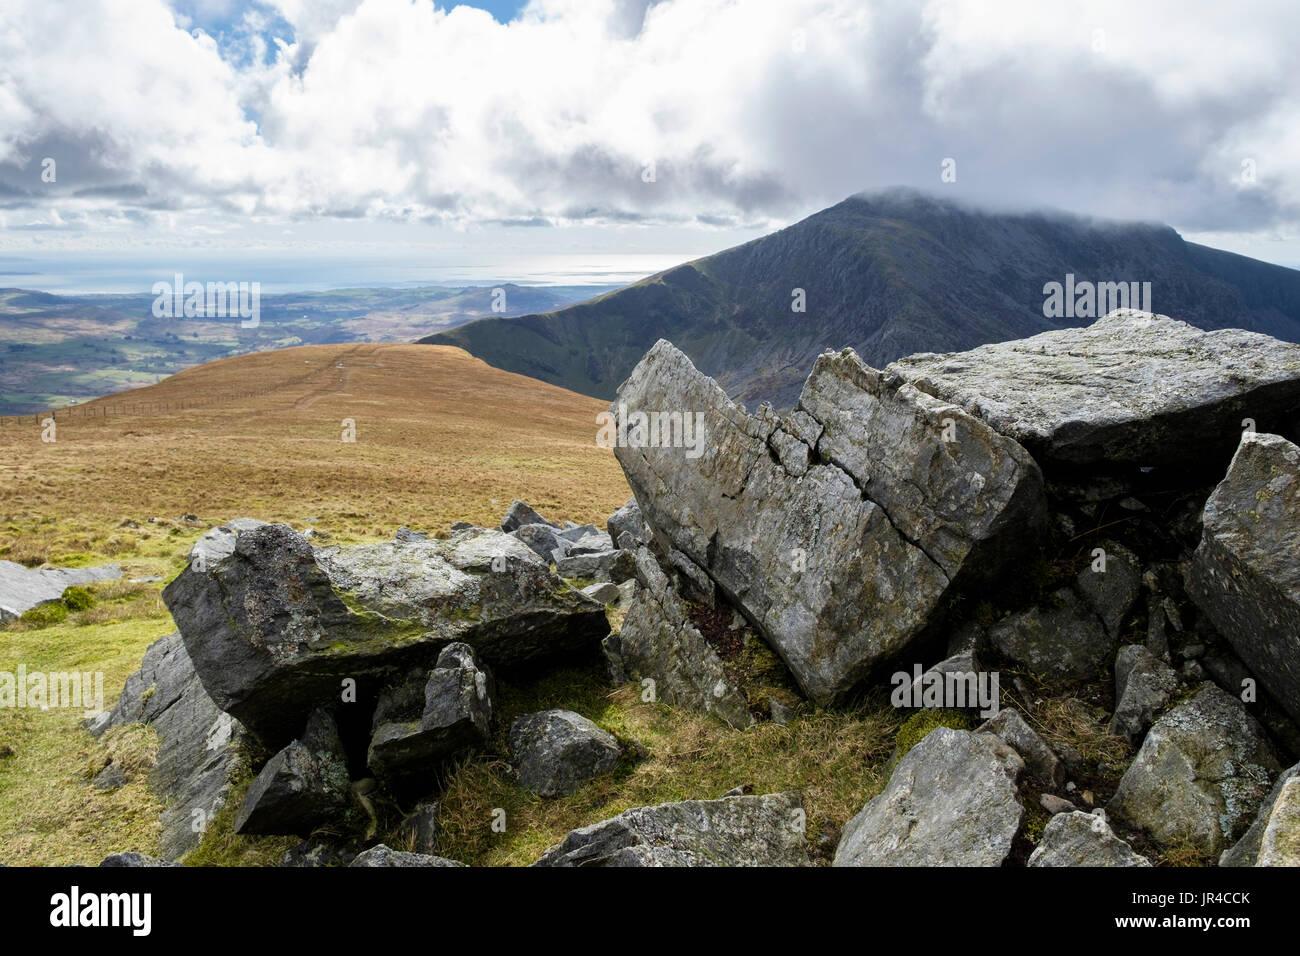 Gebrochenen Felsbrocken auf Mynydd Tal-y-Mignedd mit Craig Cwm Silyn darüber hinaus auf Nantlle Ridge in Berge von Snowdonia-Nationalpark. Gwynedd Wales UK Stockbild